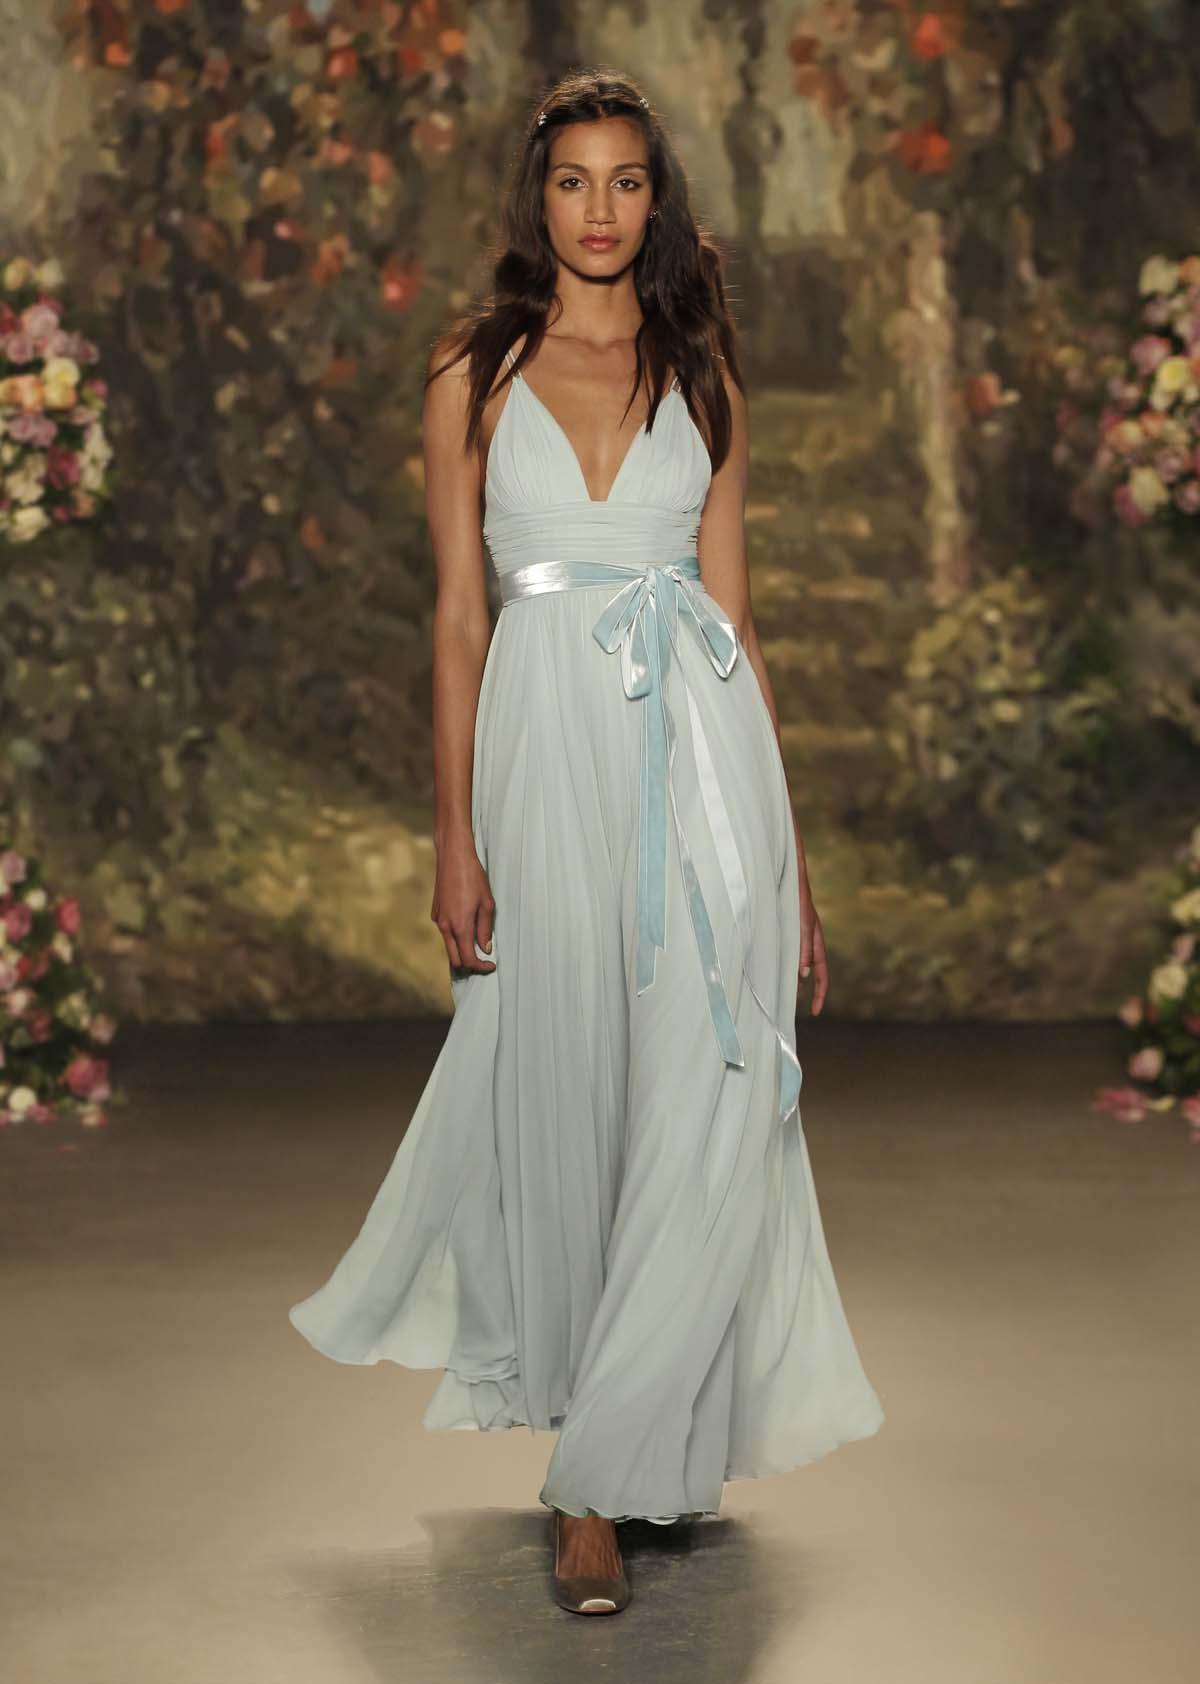 Hochzeitskleider von Jenny Packham: Kollektion 2016